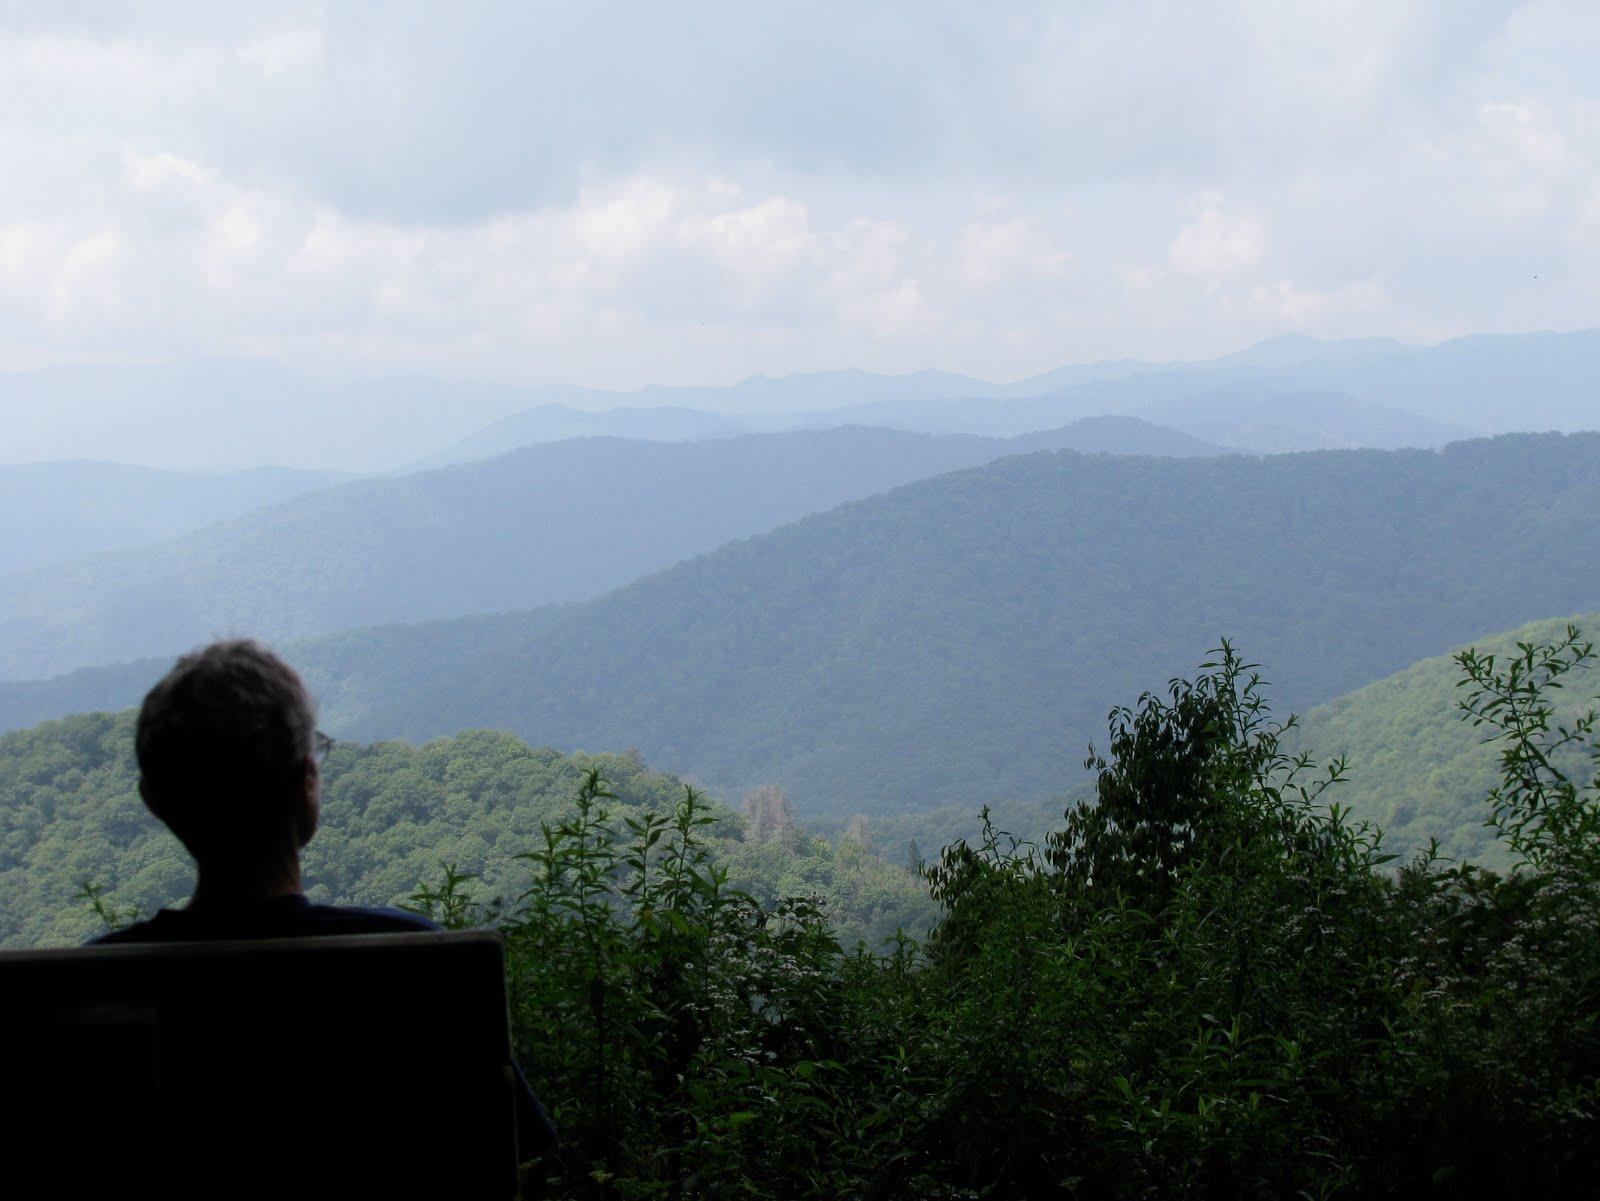 Where S Liz Balsam Mountain